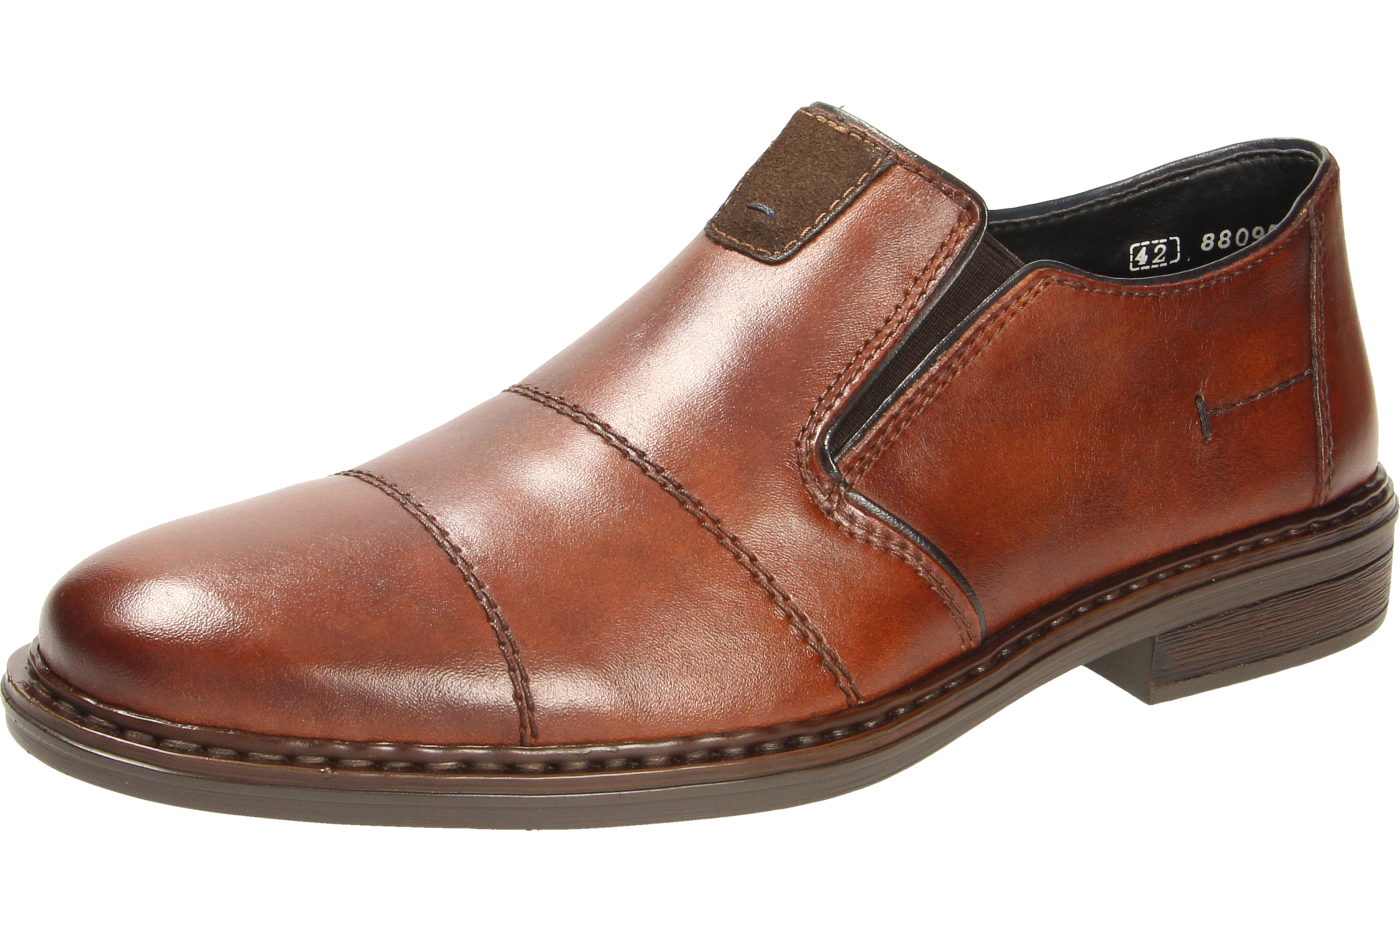 Rieker Herren Slipper 17661 23 | Business Schuhe | MLBOd